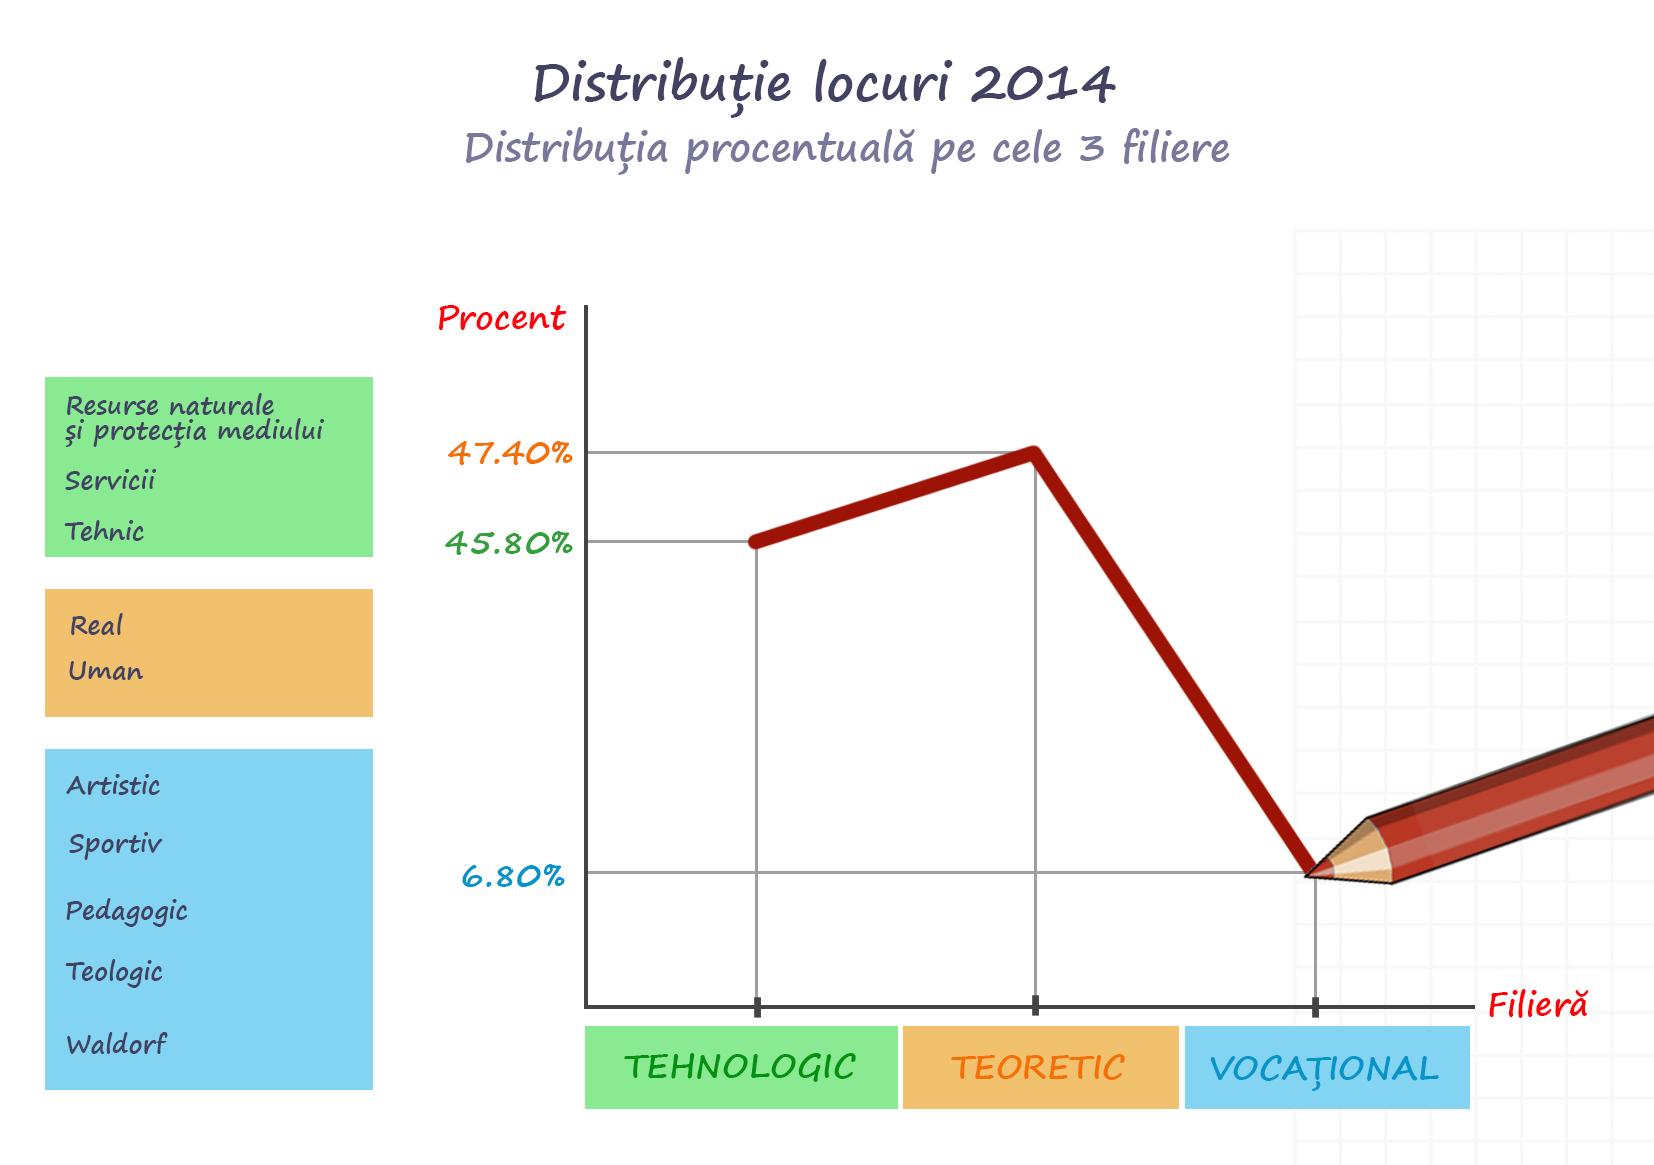 Distributie locuri in functie de filiera